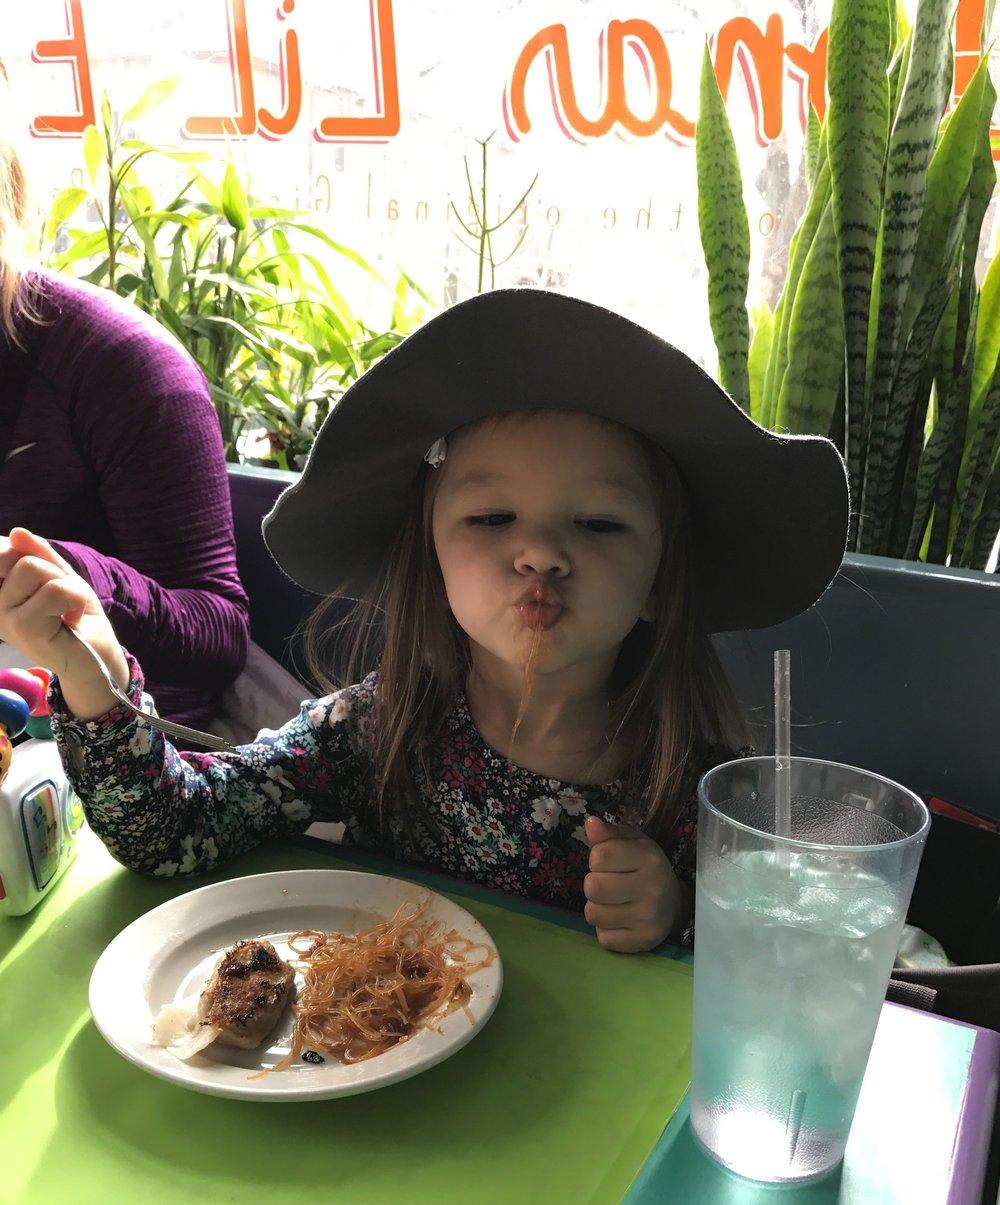 A girl with good taste. Enjoying the stir-fried glass noodles and a steak-mushroom dumpling.